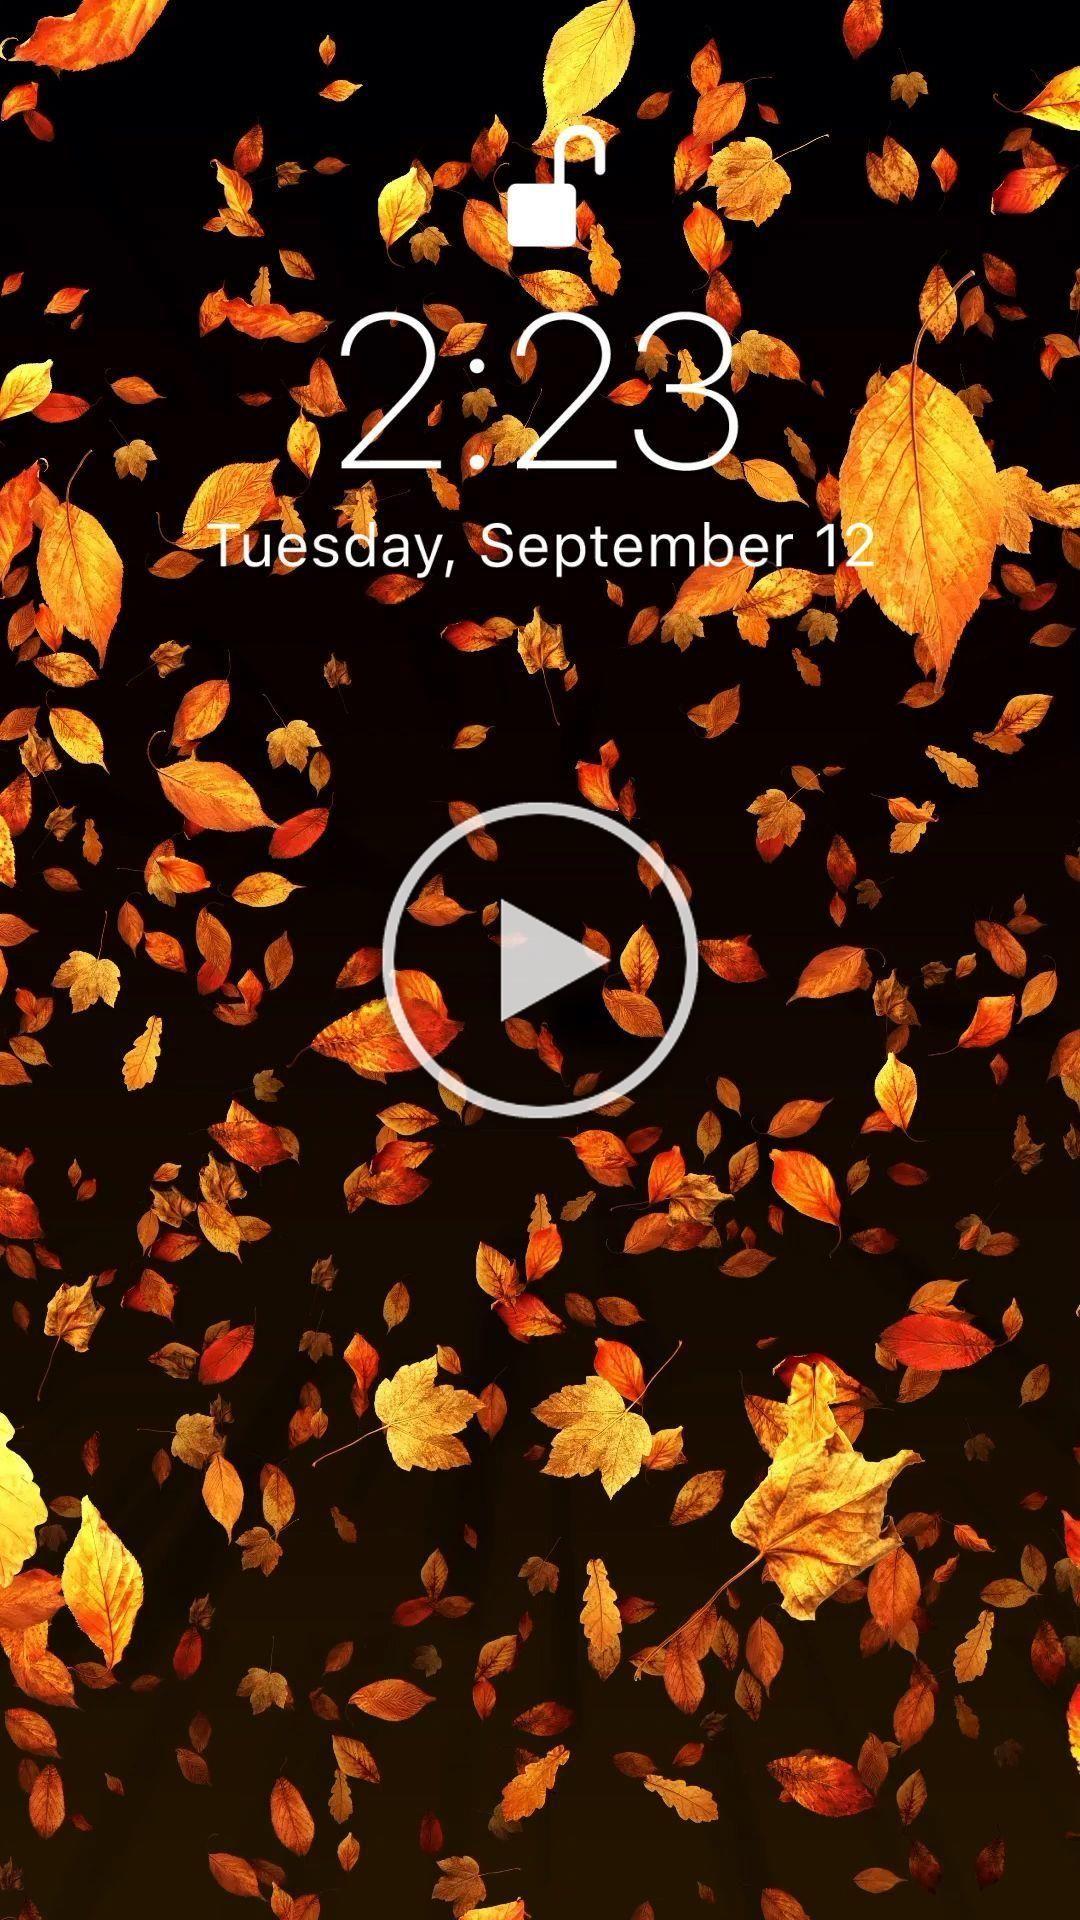 Samsung Wallpaper Videos Hintergrundbild Tapete September Calendar Live Wallpaper For Your Ipho Calendar Wallpaper September Wallpaper Iphone Wallpaper Video